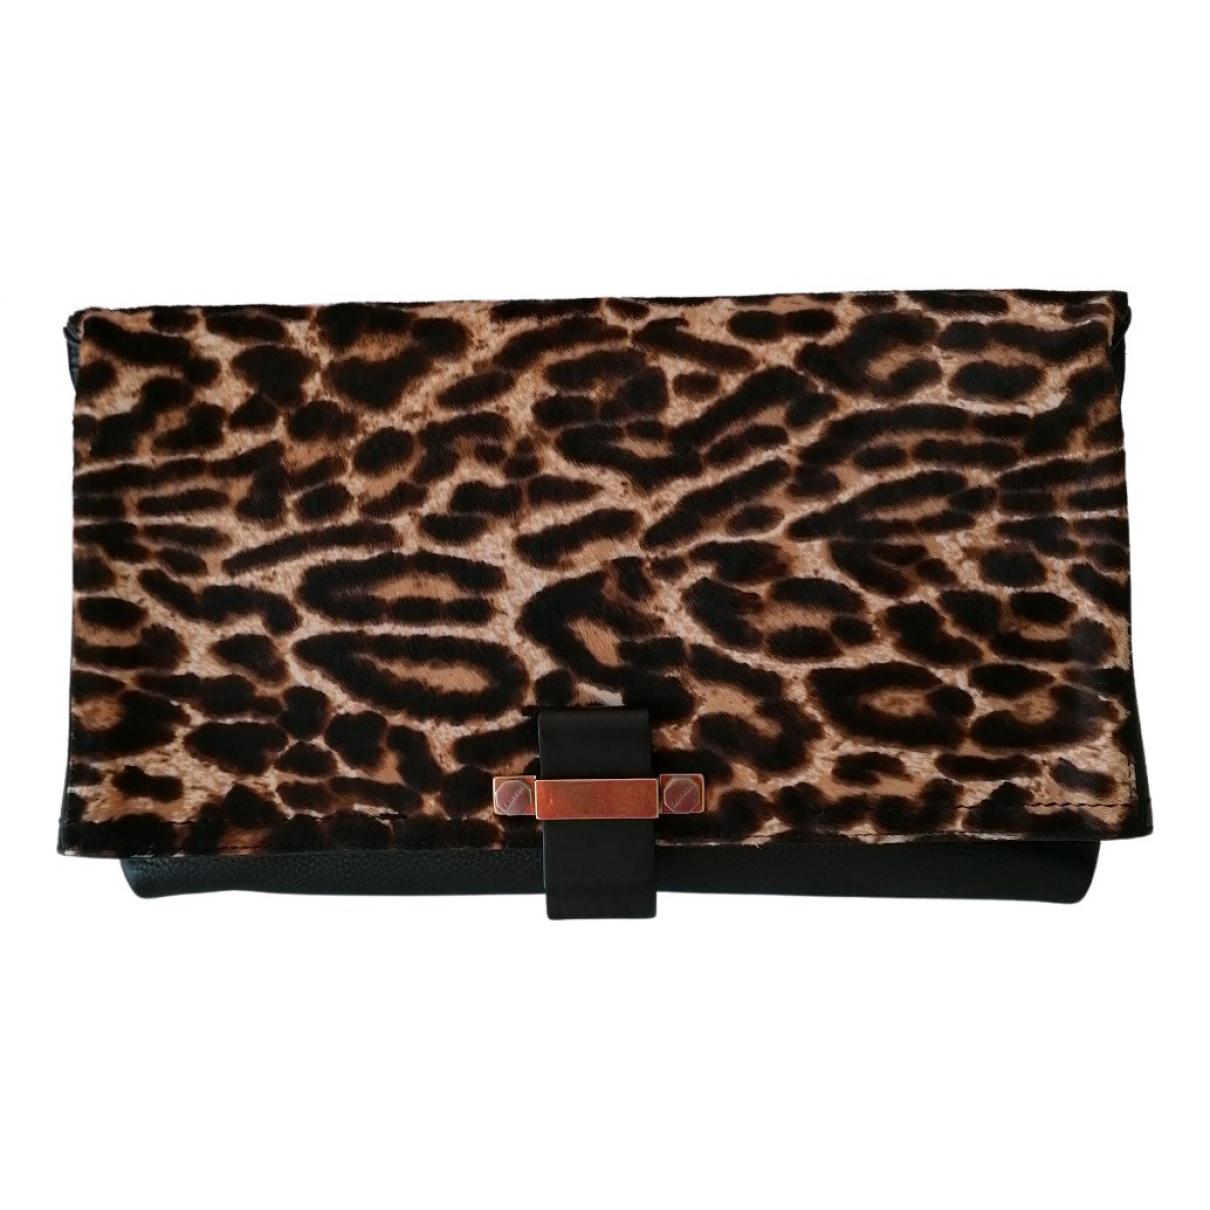 Lanvin N Black Leather Clutch bag for Women N